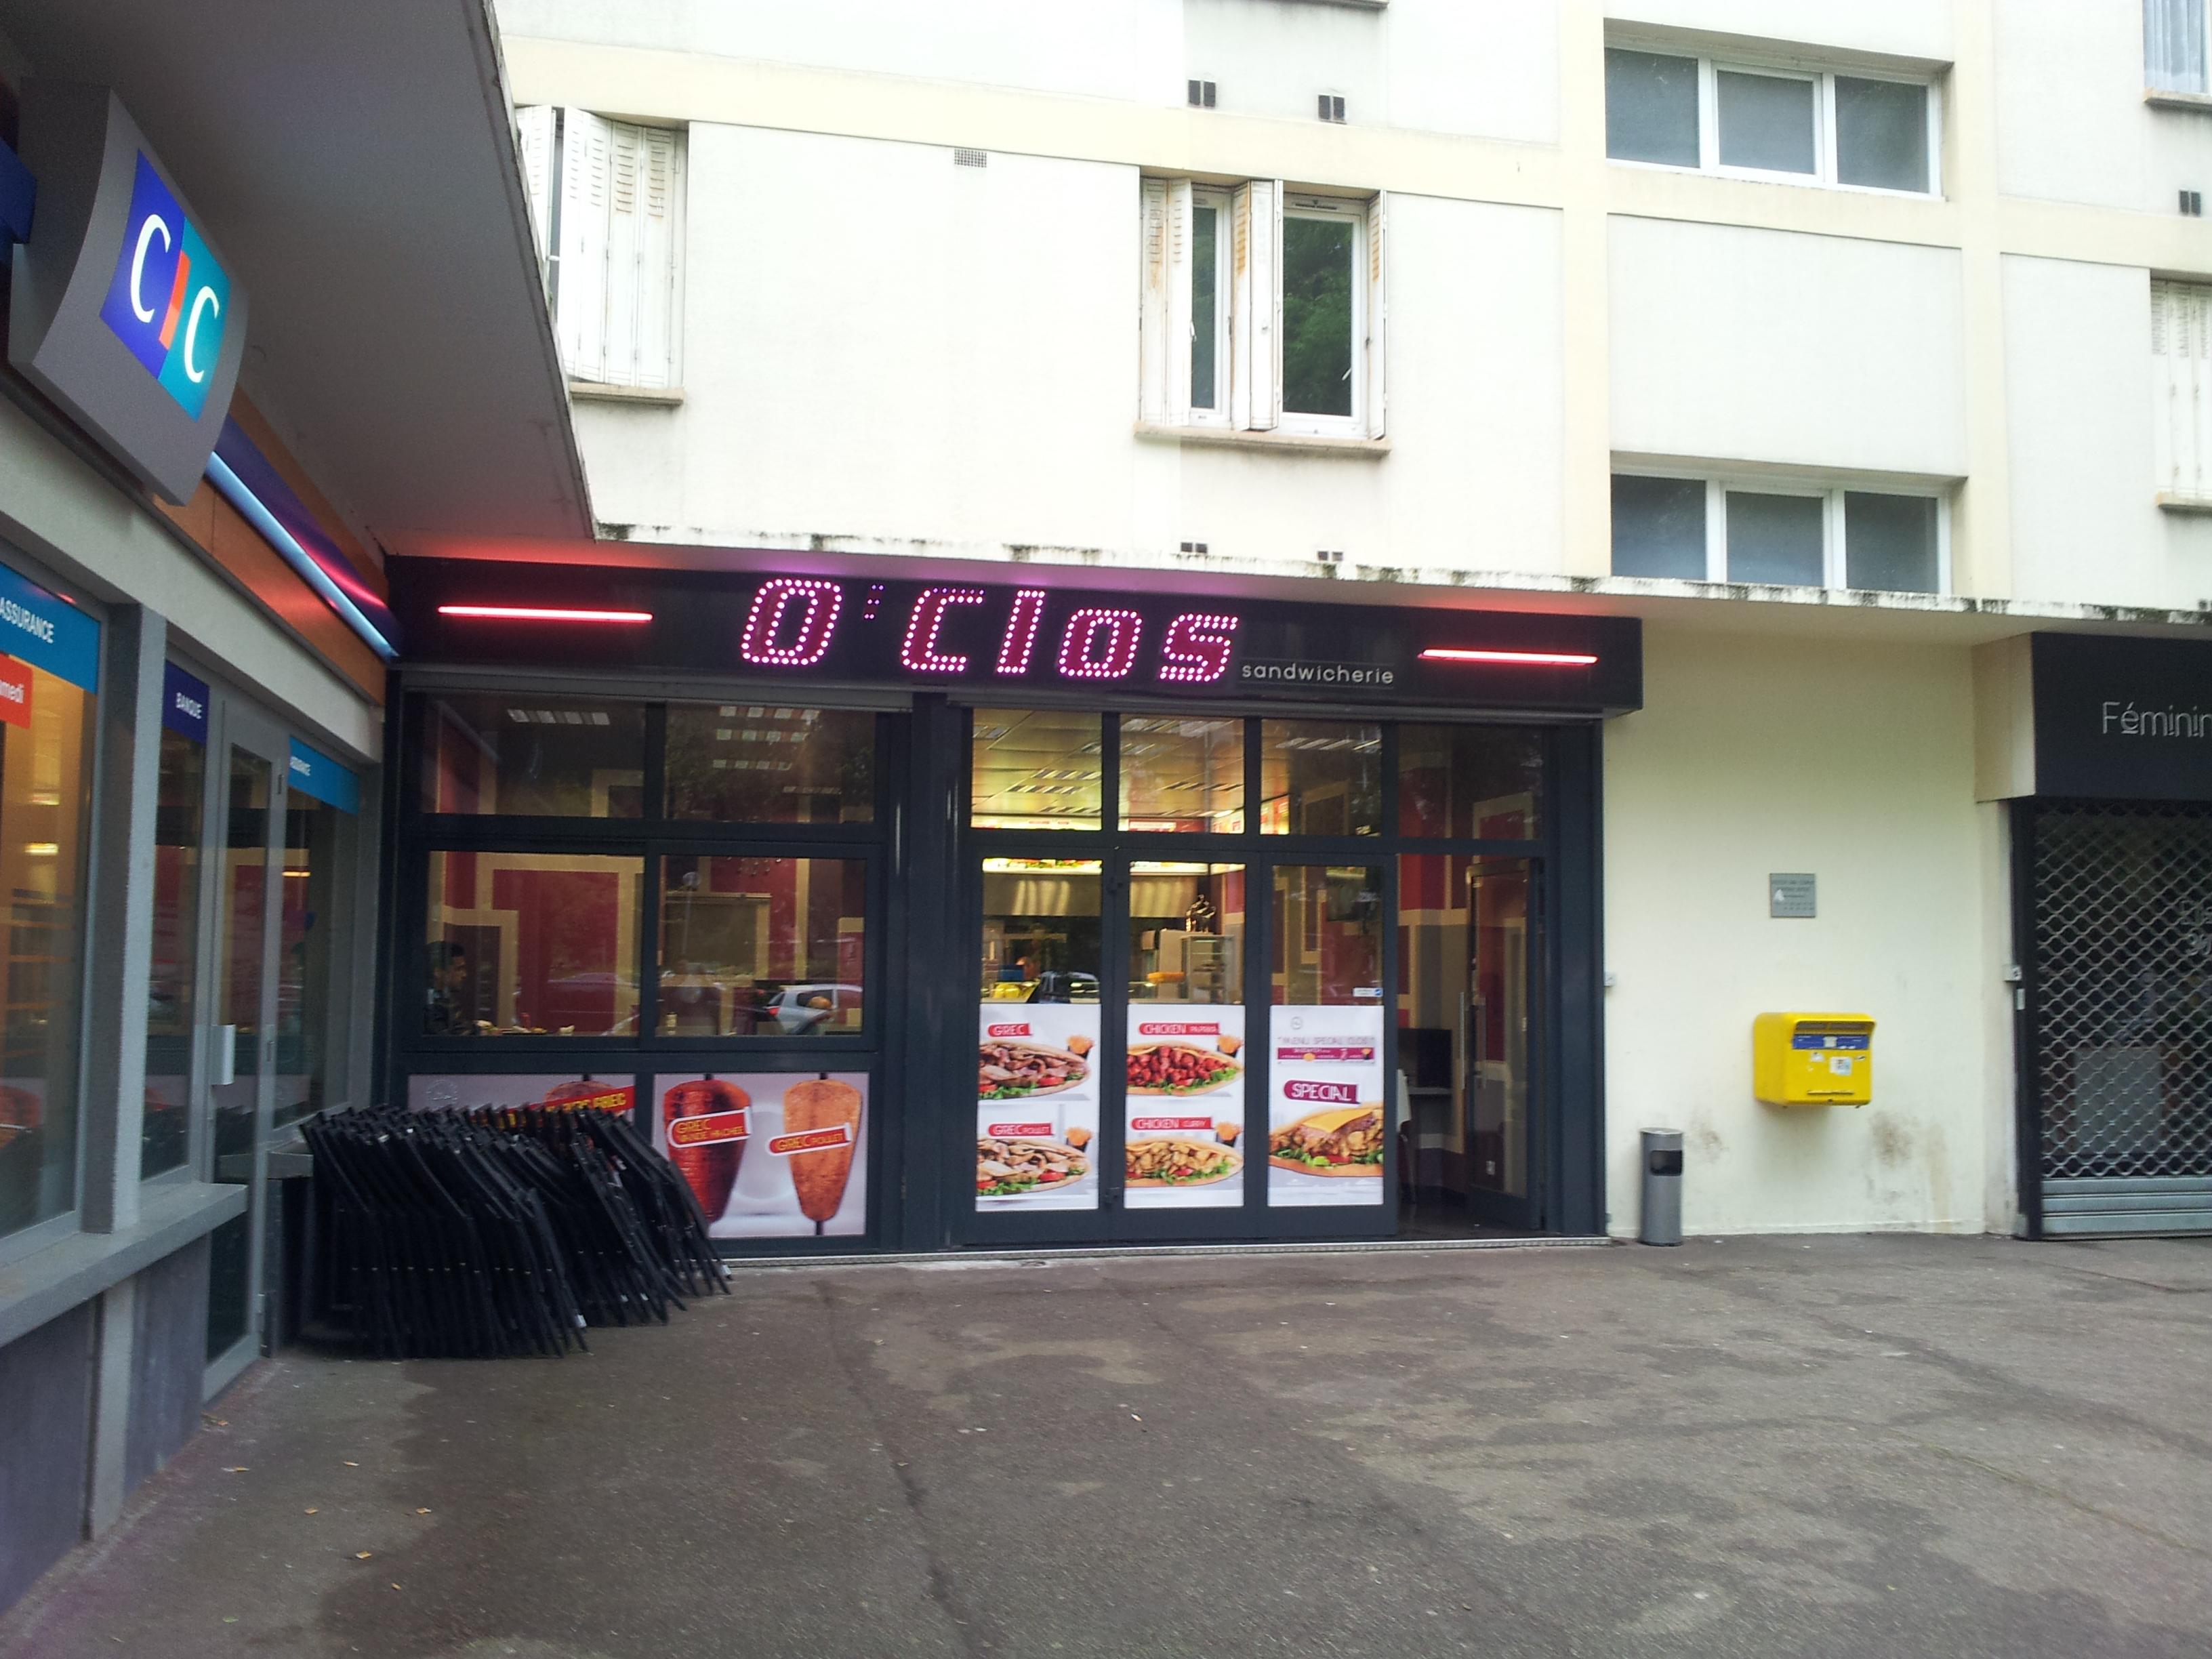 O'Clos